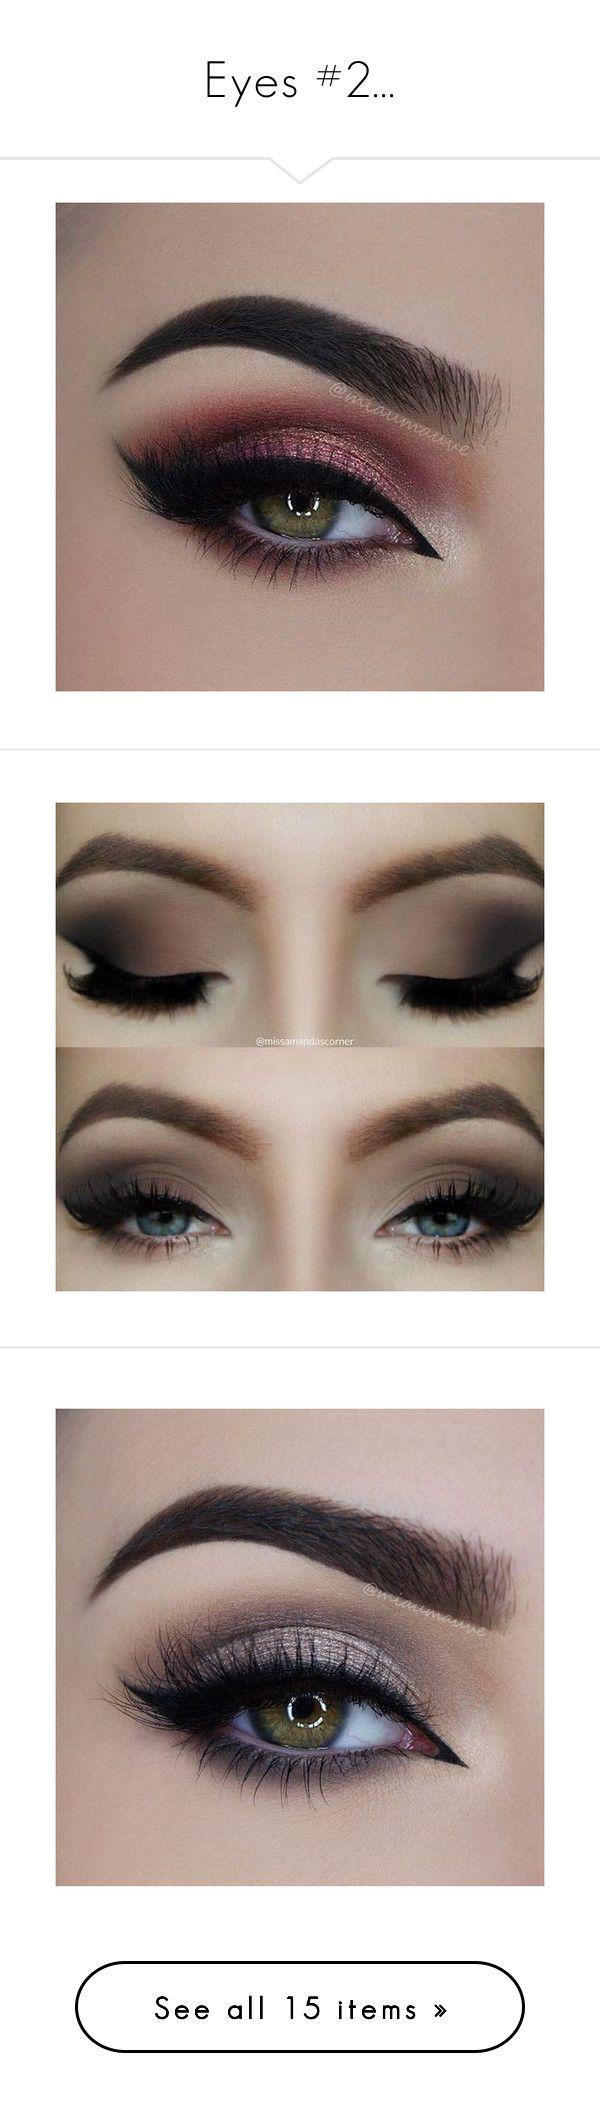 """Eyes #2..."" by lola0413 ❤ liked on Polyvore featuring beauty products, makeup, eyes, eye makeup, beauty, false eyelashes, eyeshadow, eye shadow, cosmetics and backgrounds"